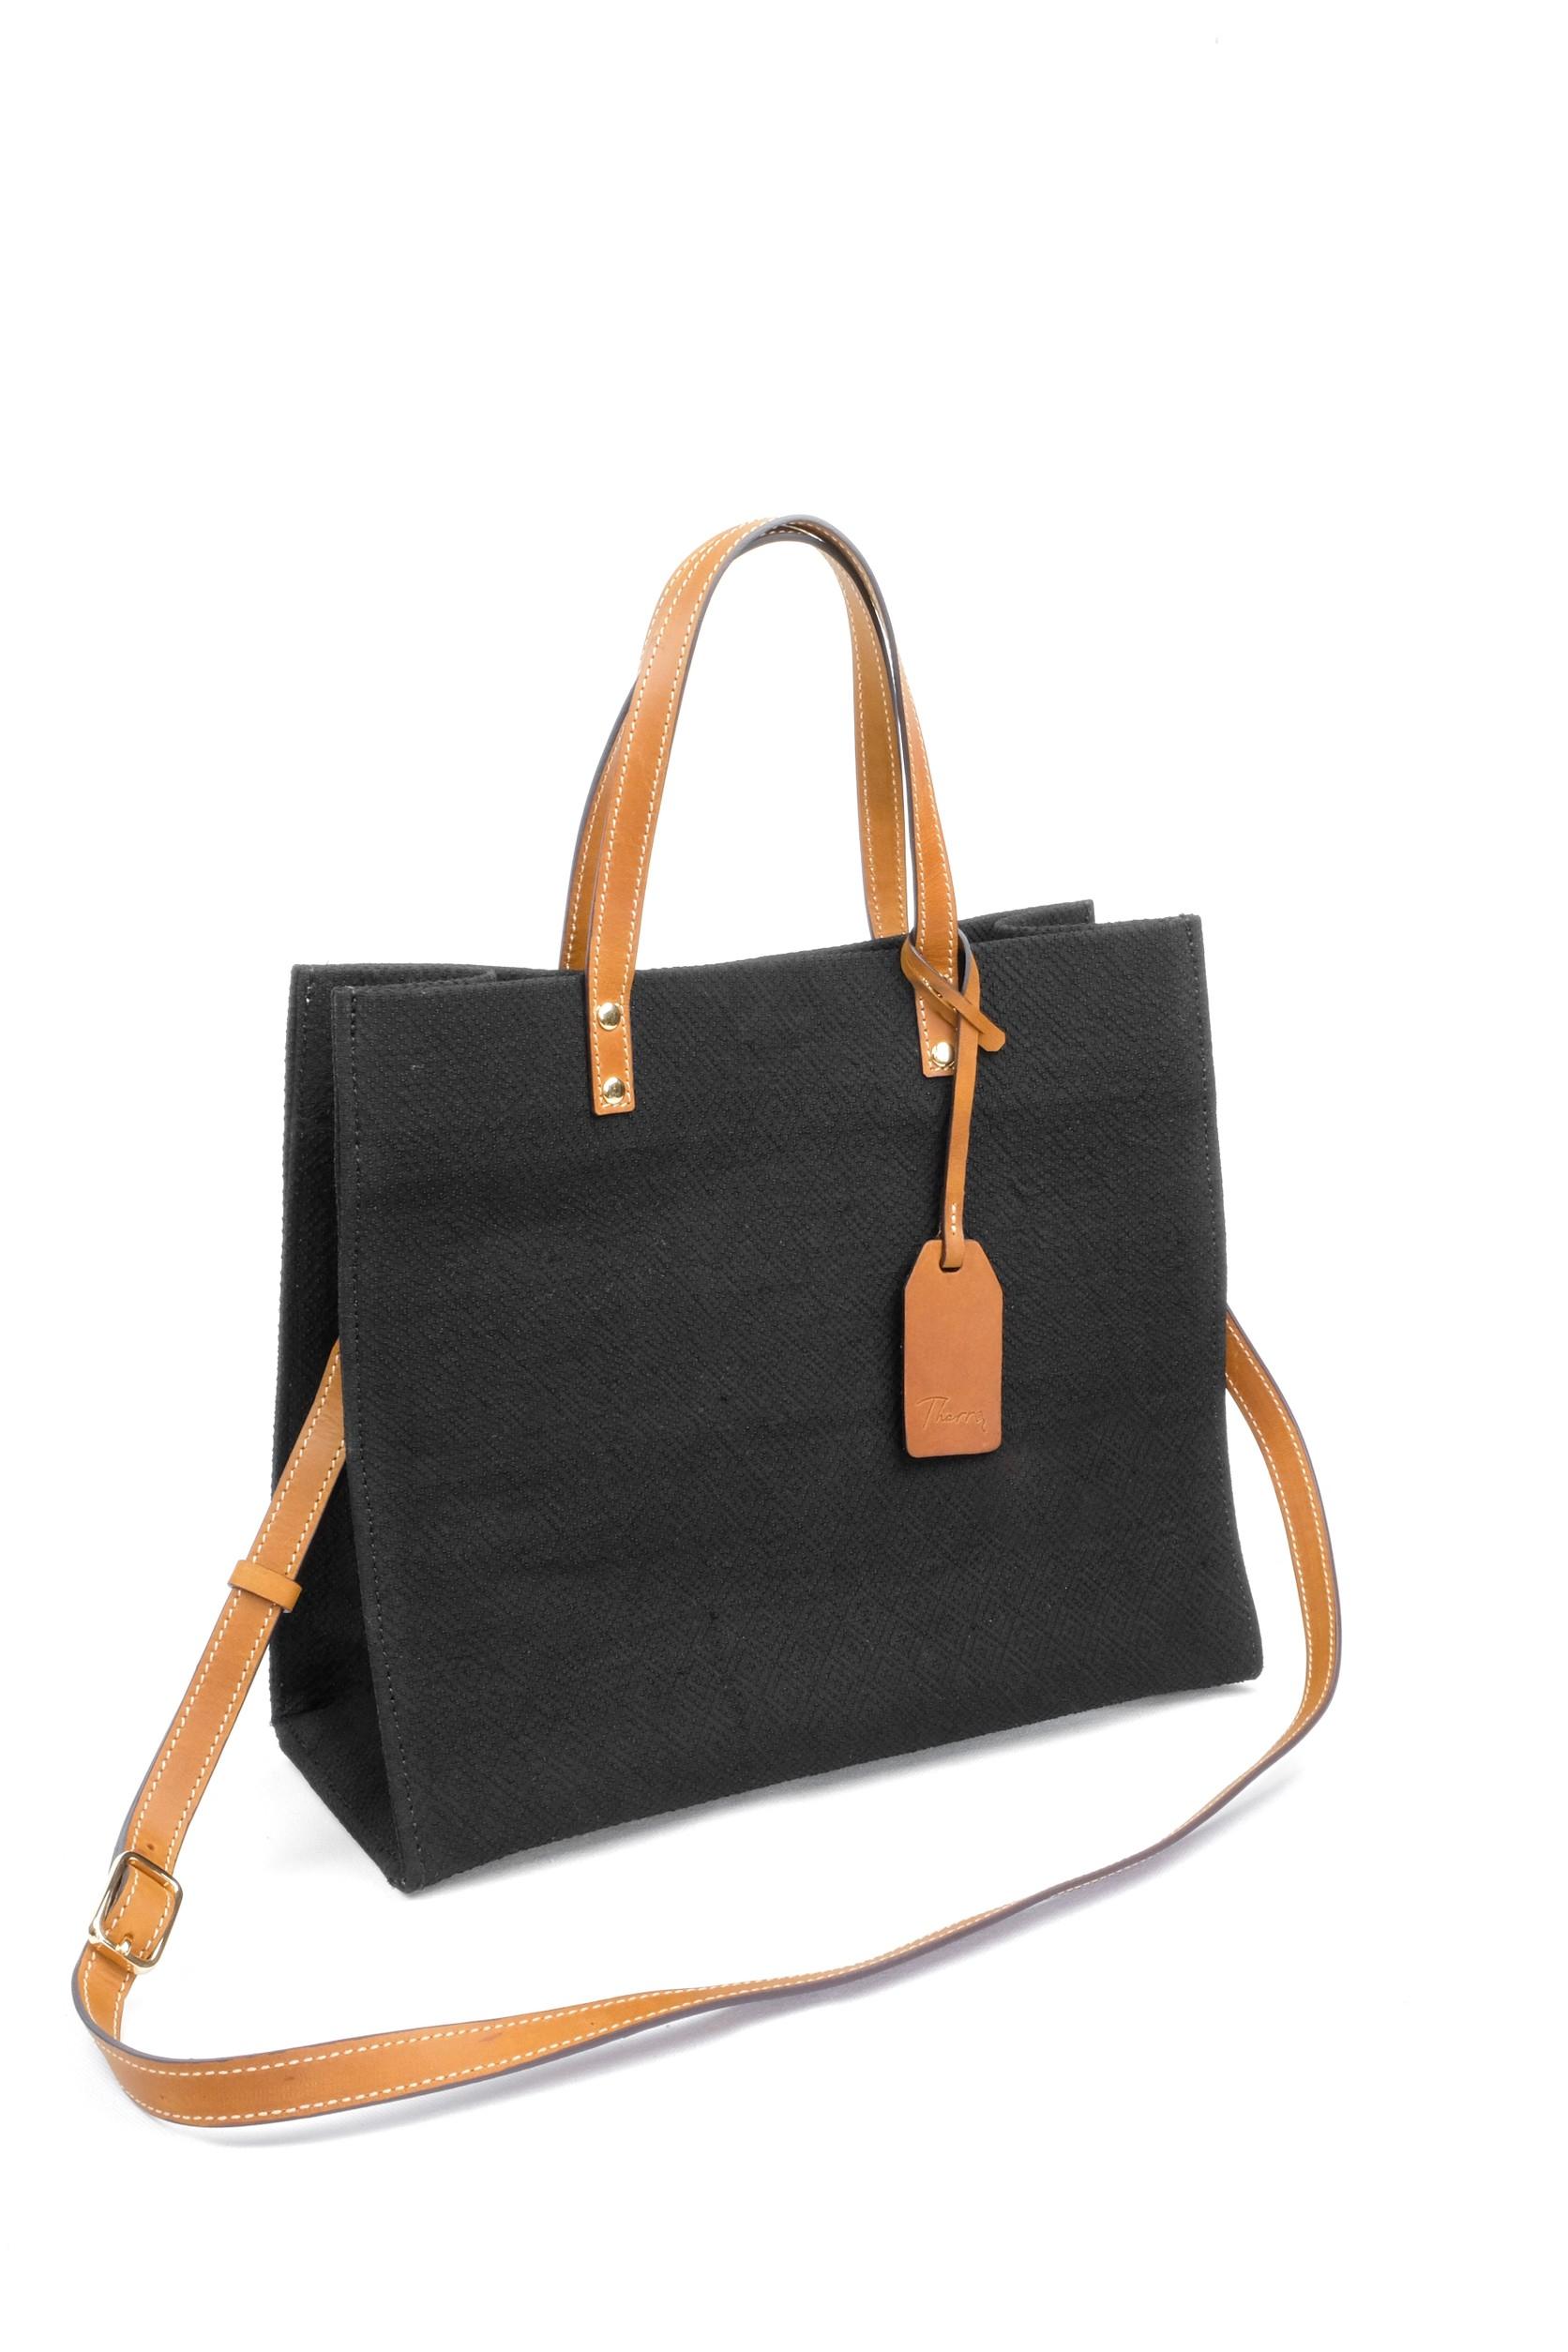 Lookkeaw bag limited